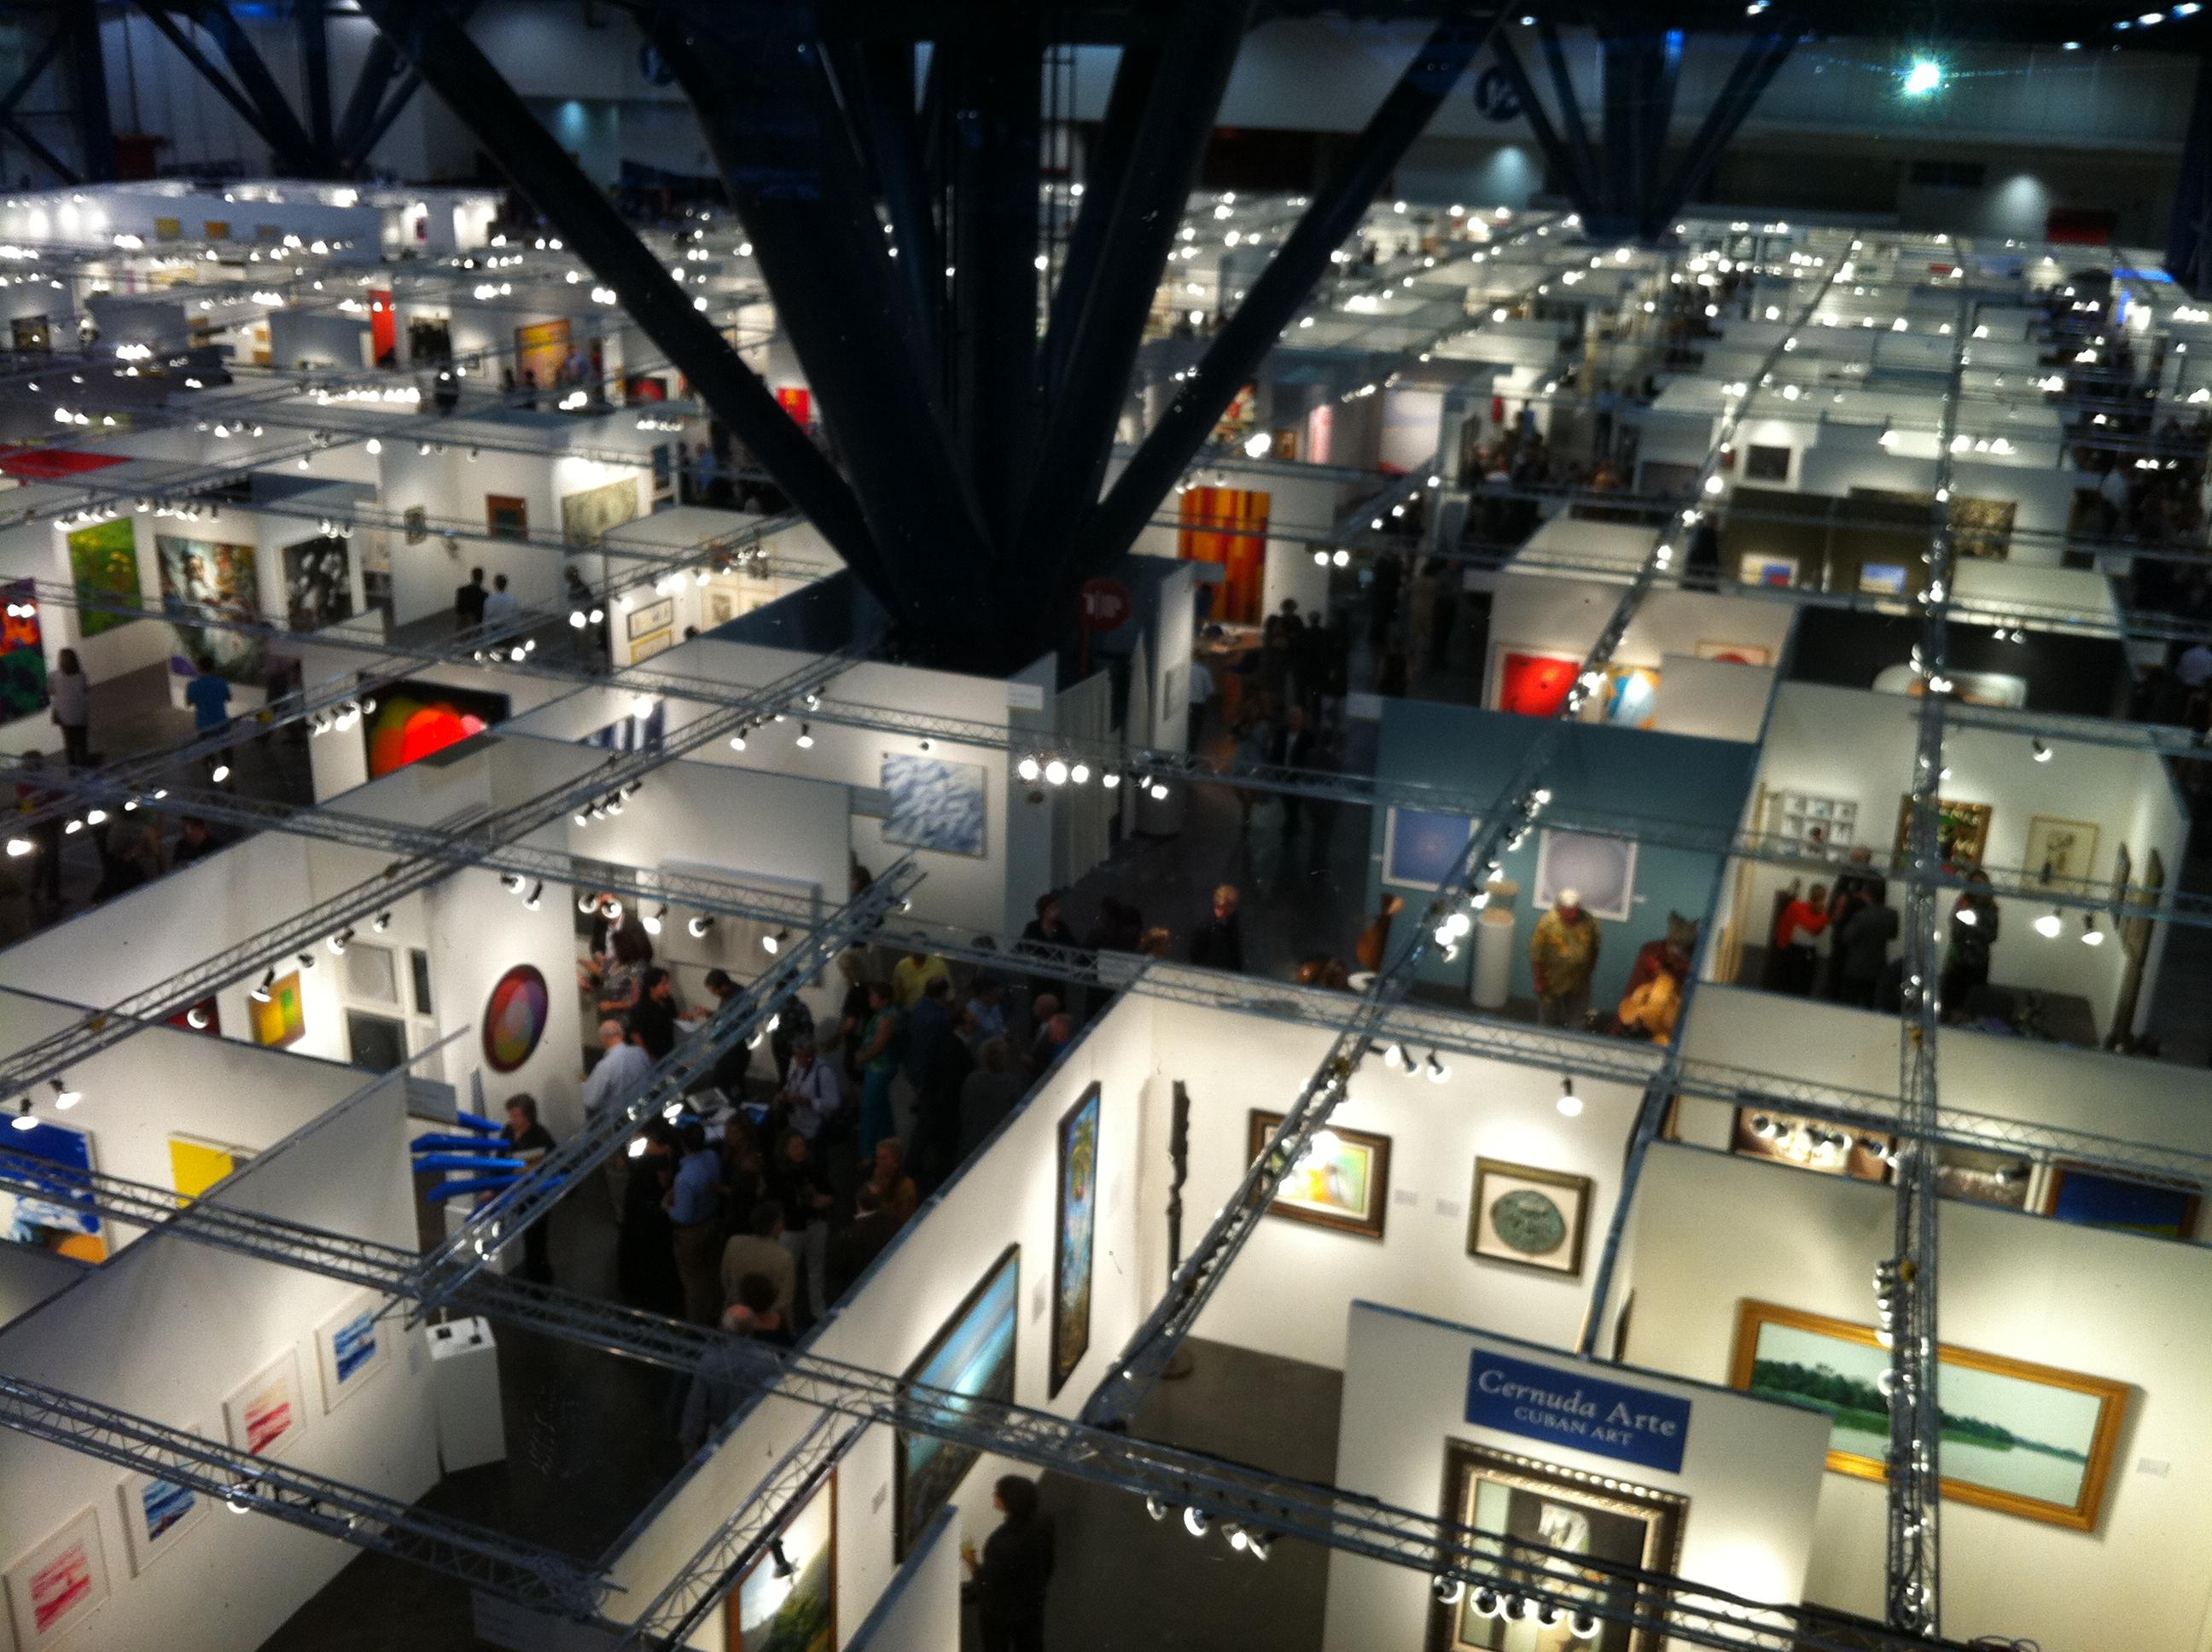 Dwarfing the Dallas Art Fair (not that we're comparing): the Houston Fine Art Fair is big!